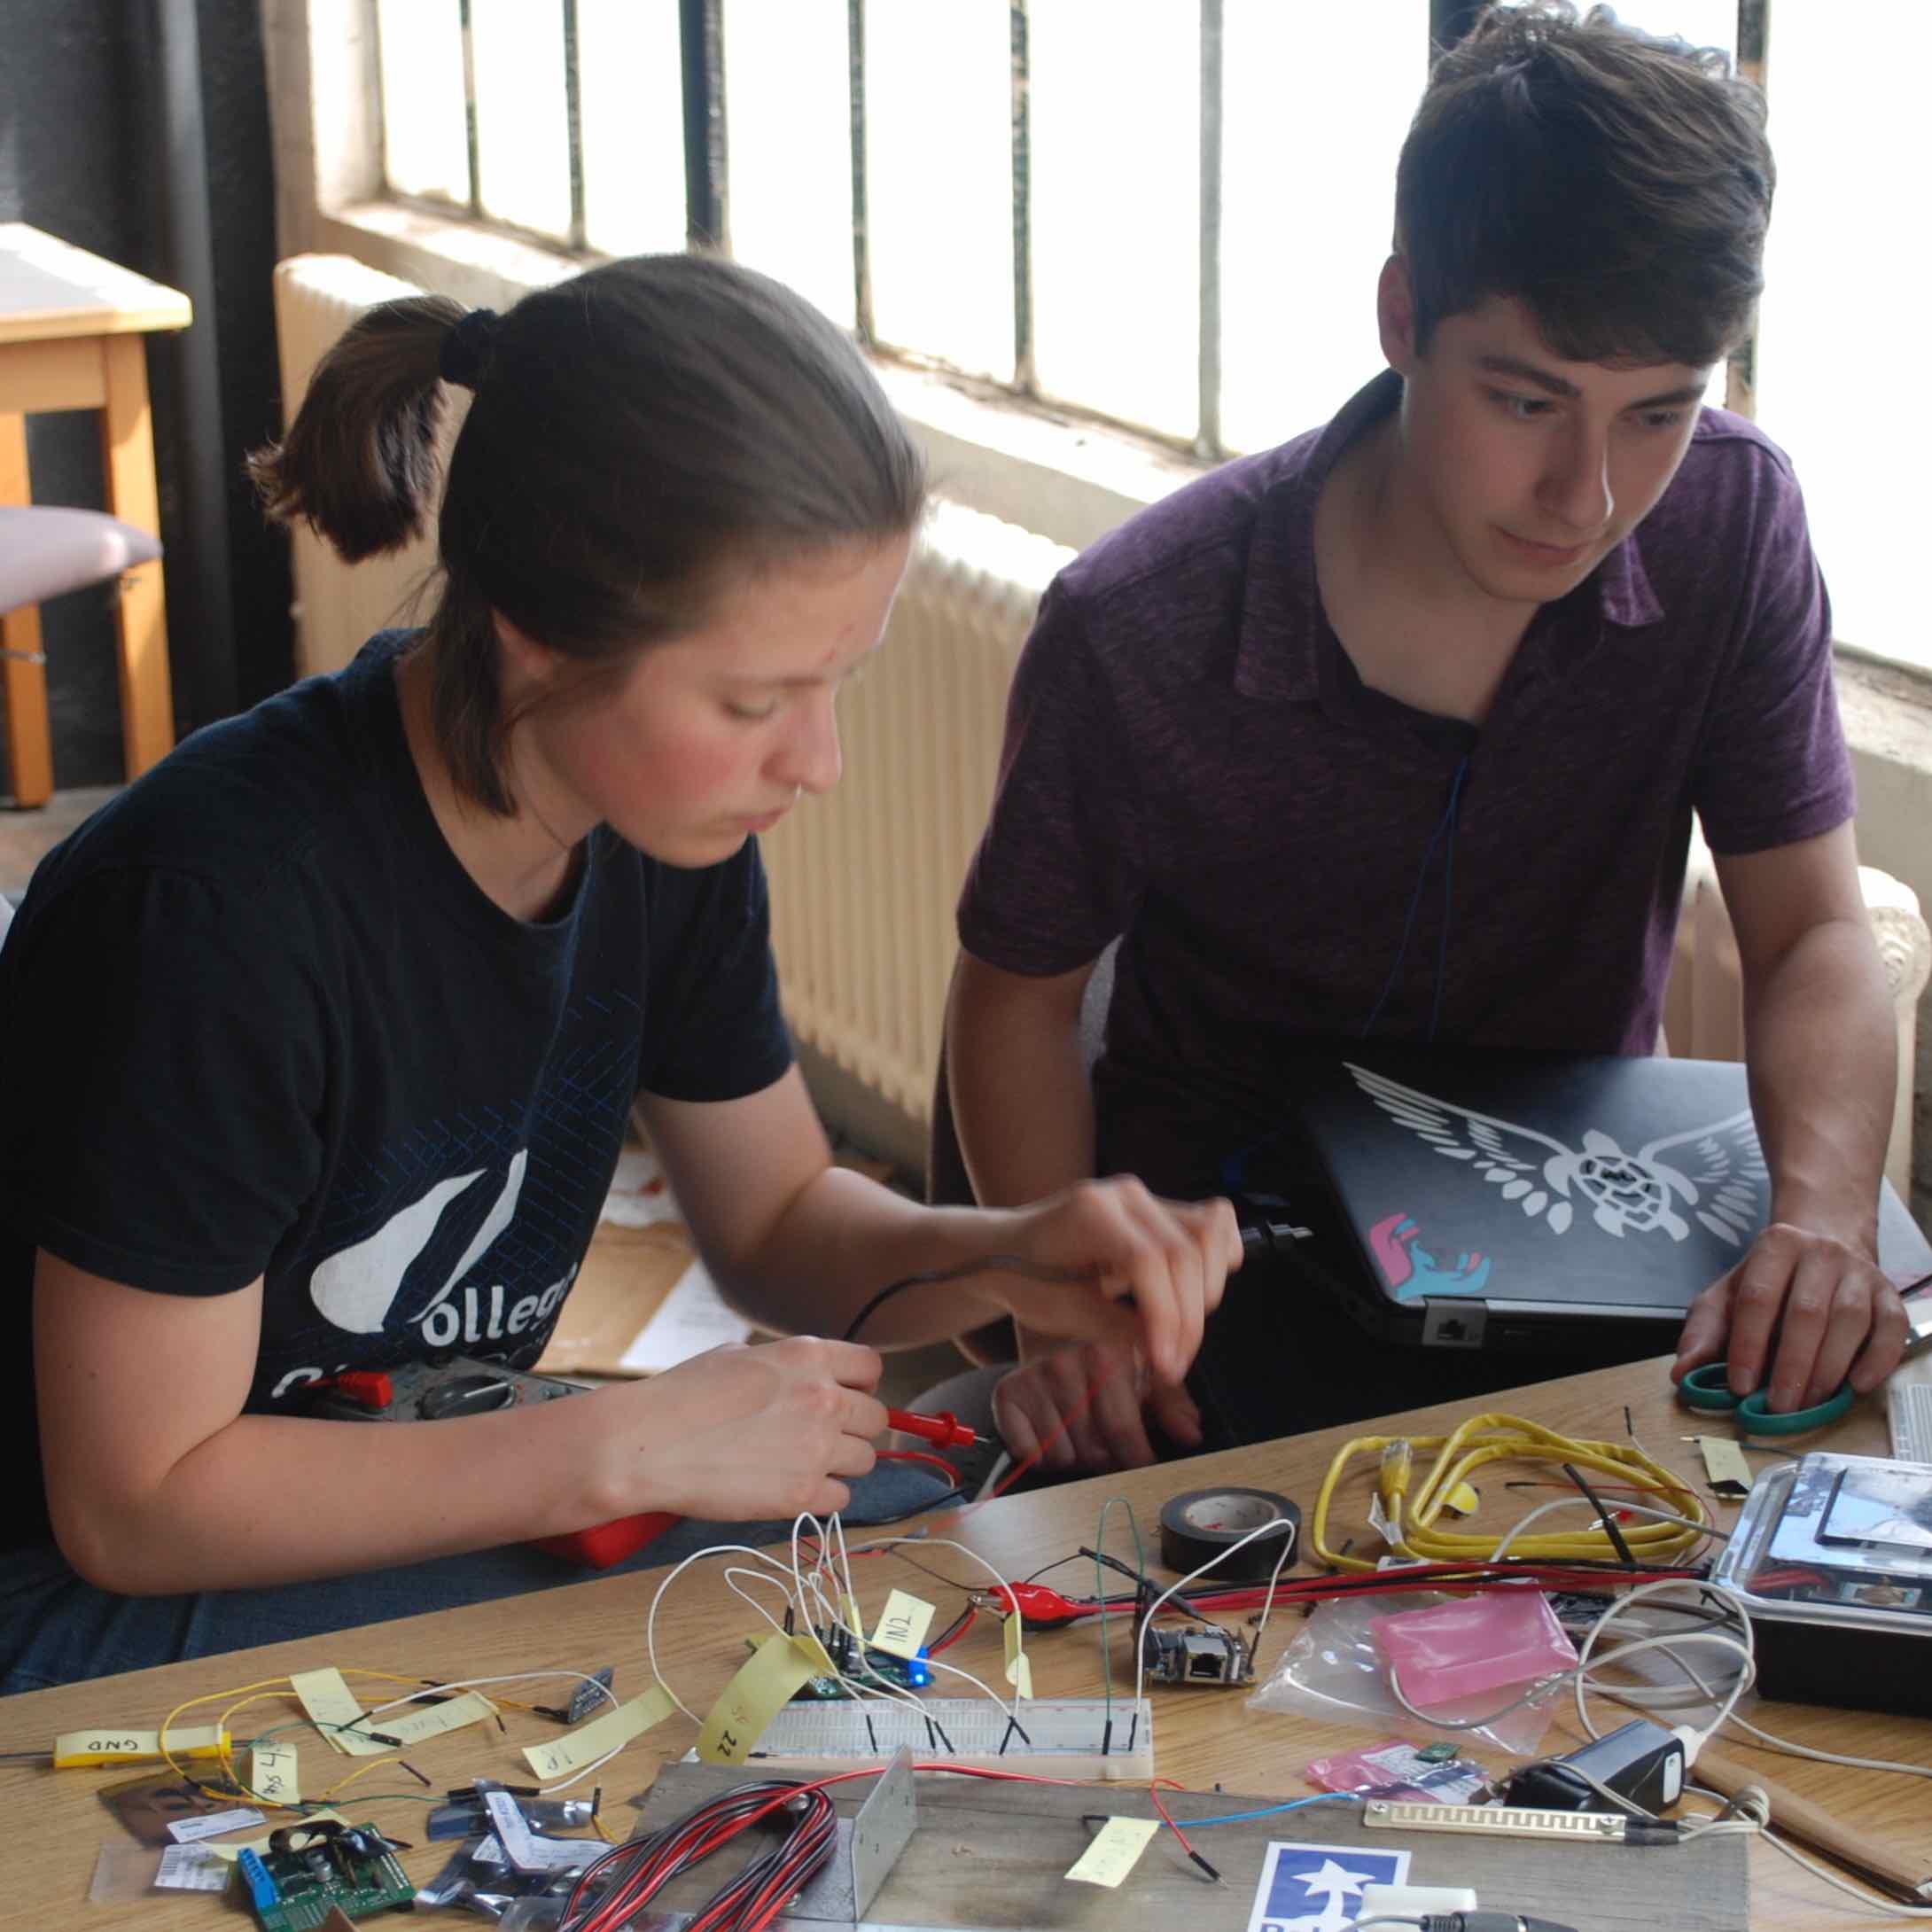 WCTI Makerspace